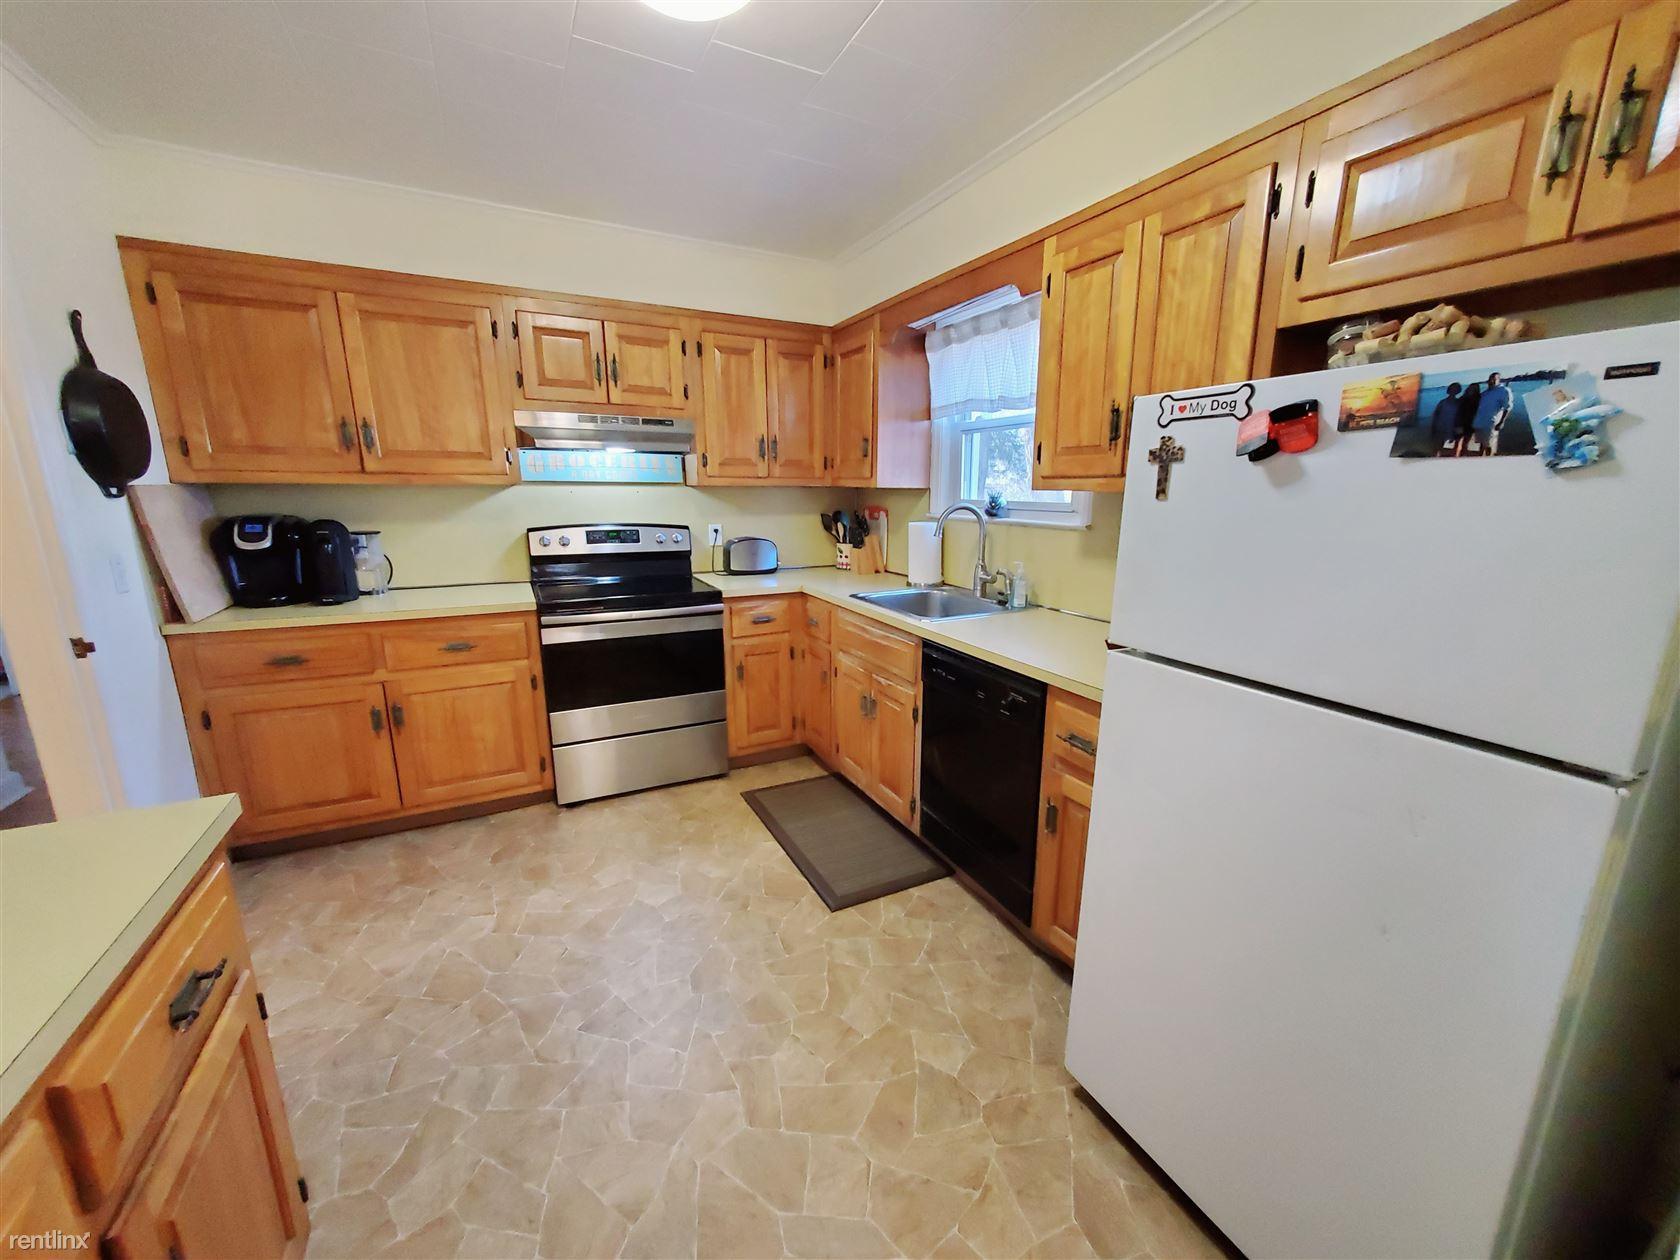 Sanford Ln, Stamford, CT - $2,500